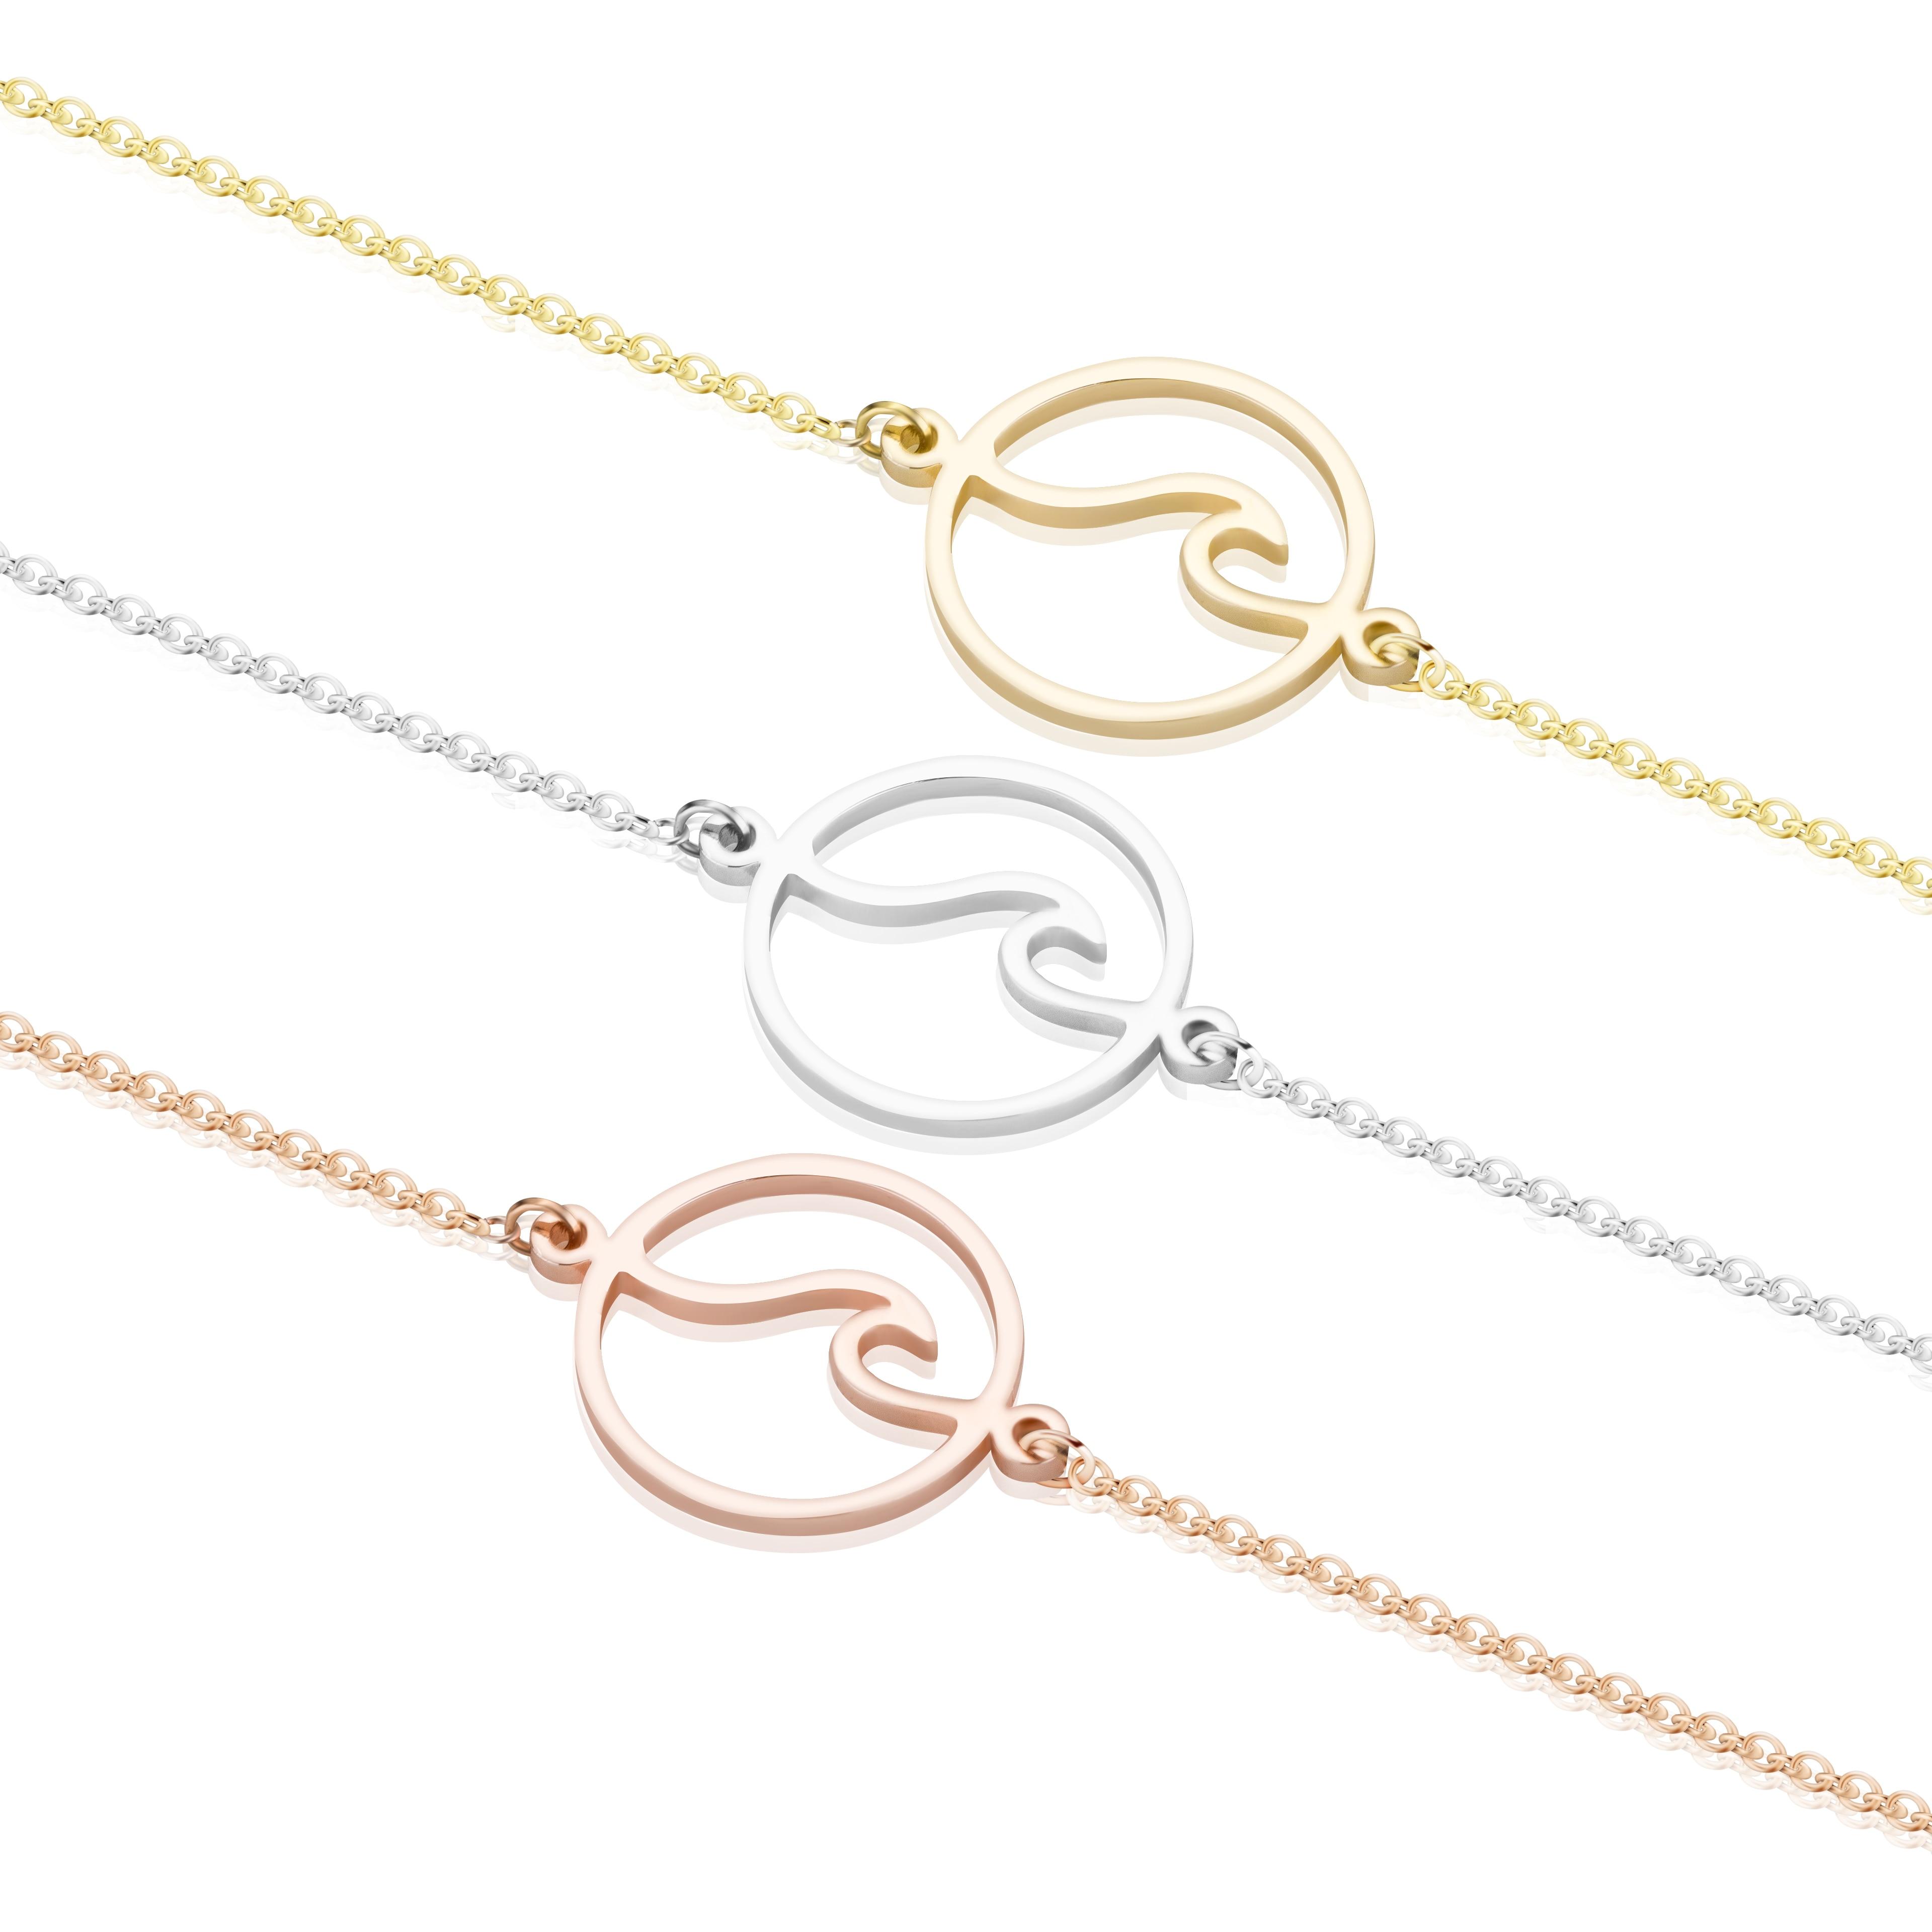 Charm Stainless Steel Ocean Sea Wave Shaped Bracelet Bangle Korean Fashion Handmade Wave Beach Jewellery Gifts for Women